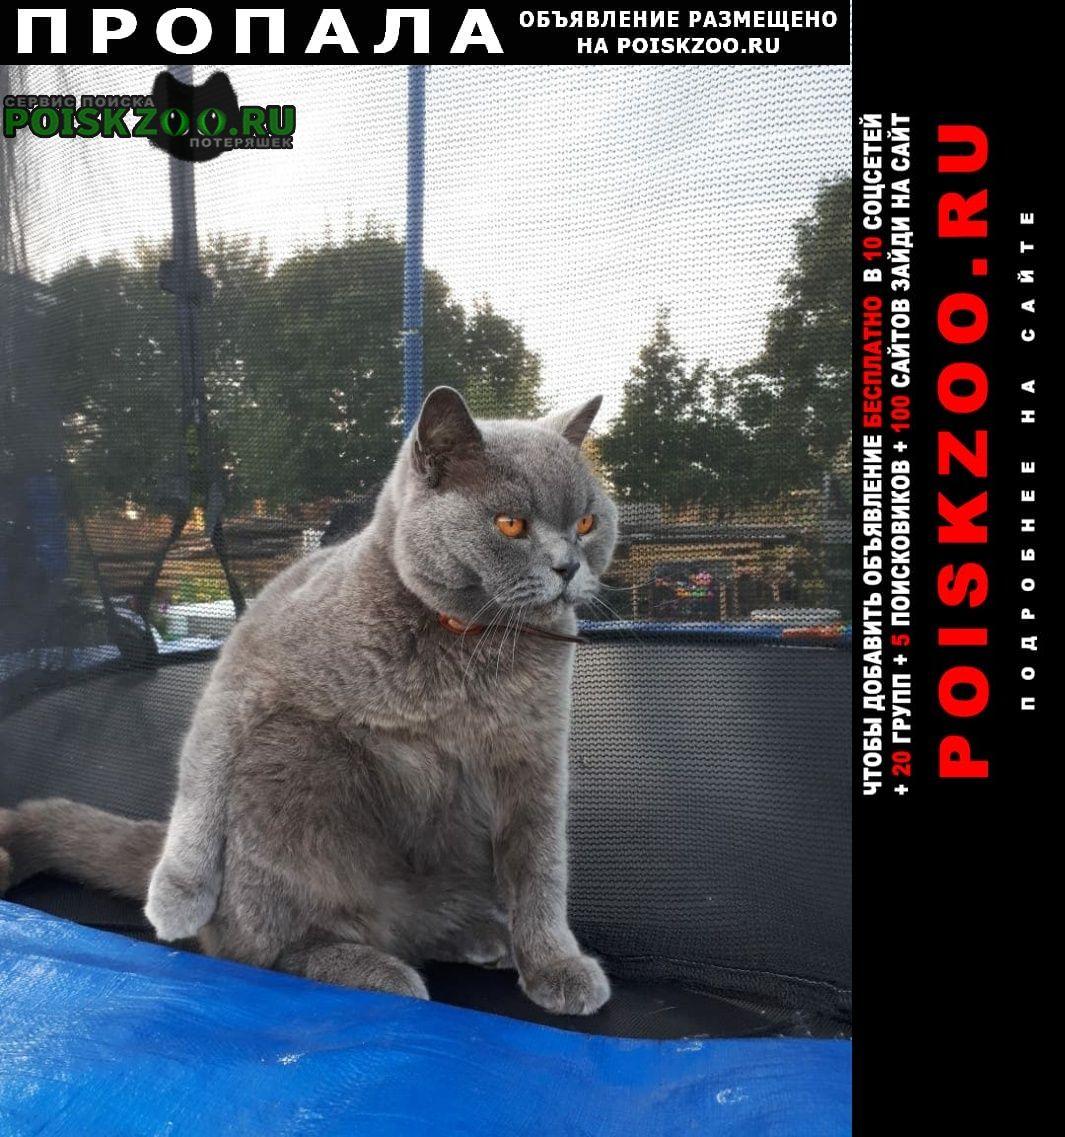 Санкт-Петербург Пропал кот метро международная